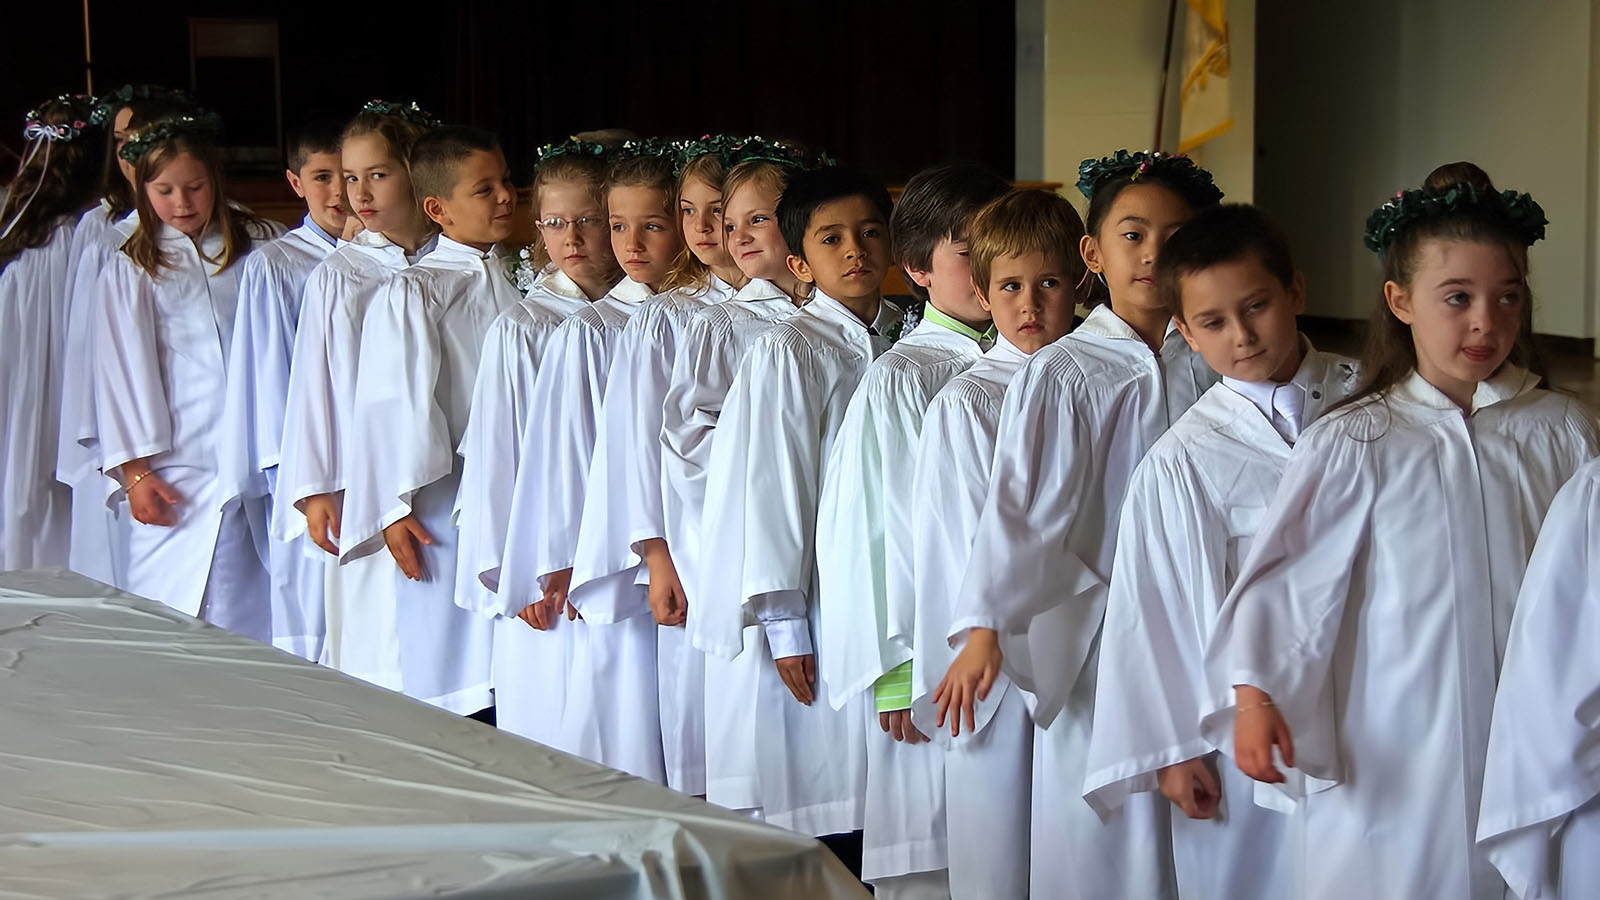 Children serving in a church in Middletown, CT.